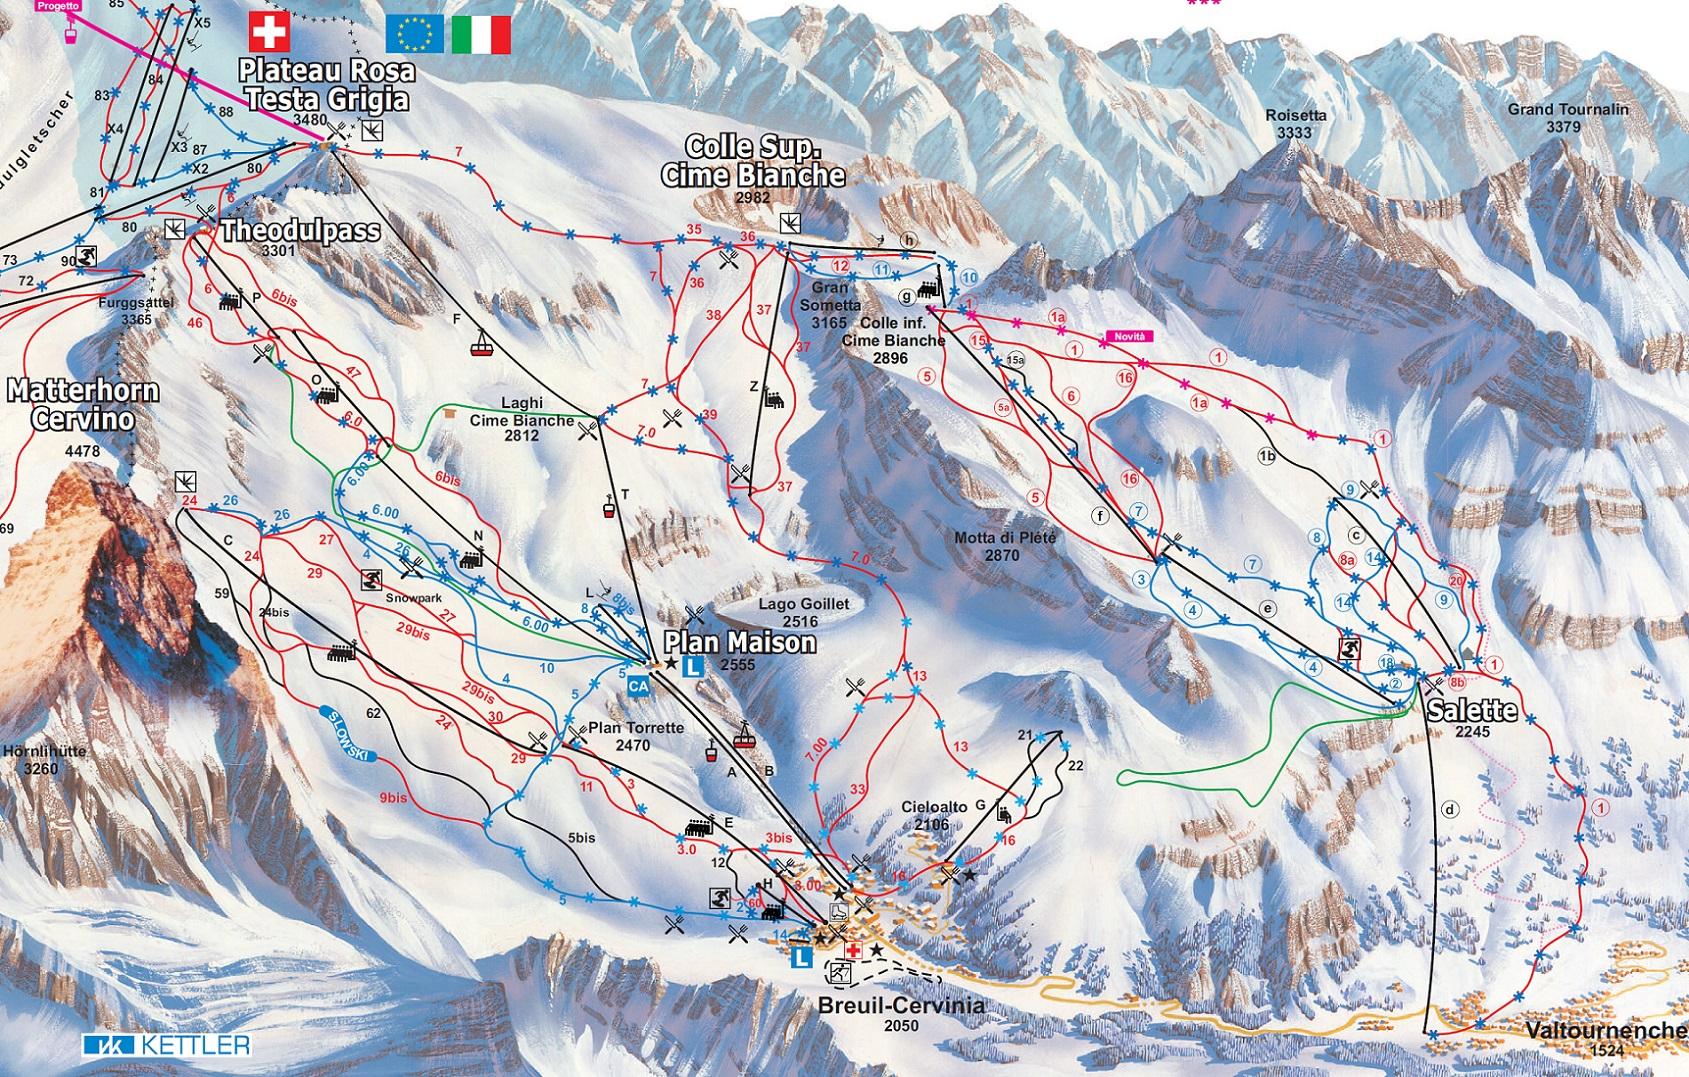 Cervinia Ski Resort Cervinia Italy Breuil Cervinia Valtournenche